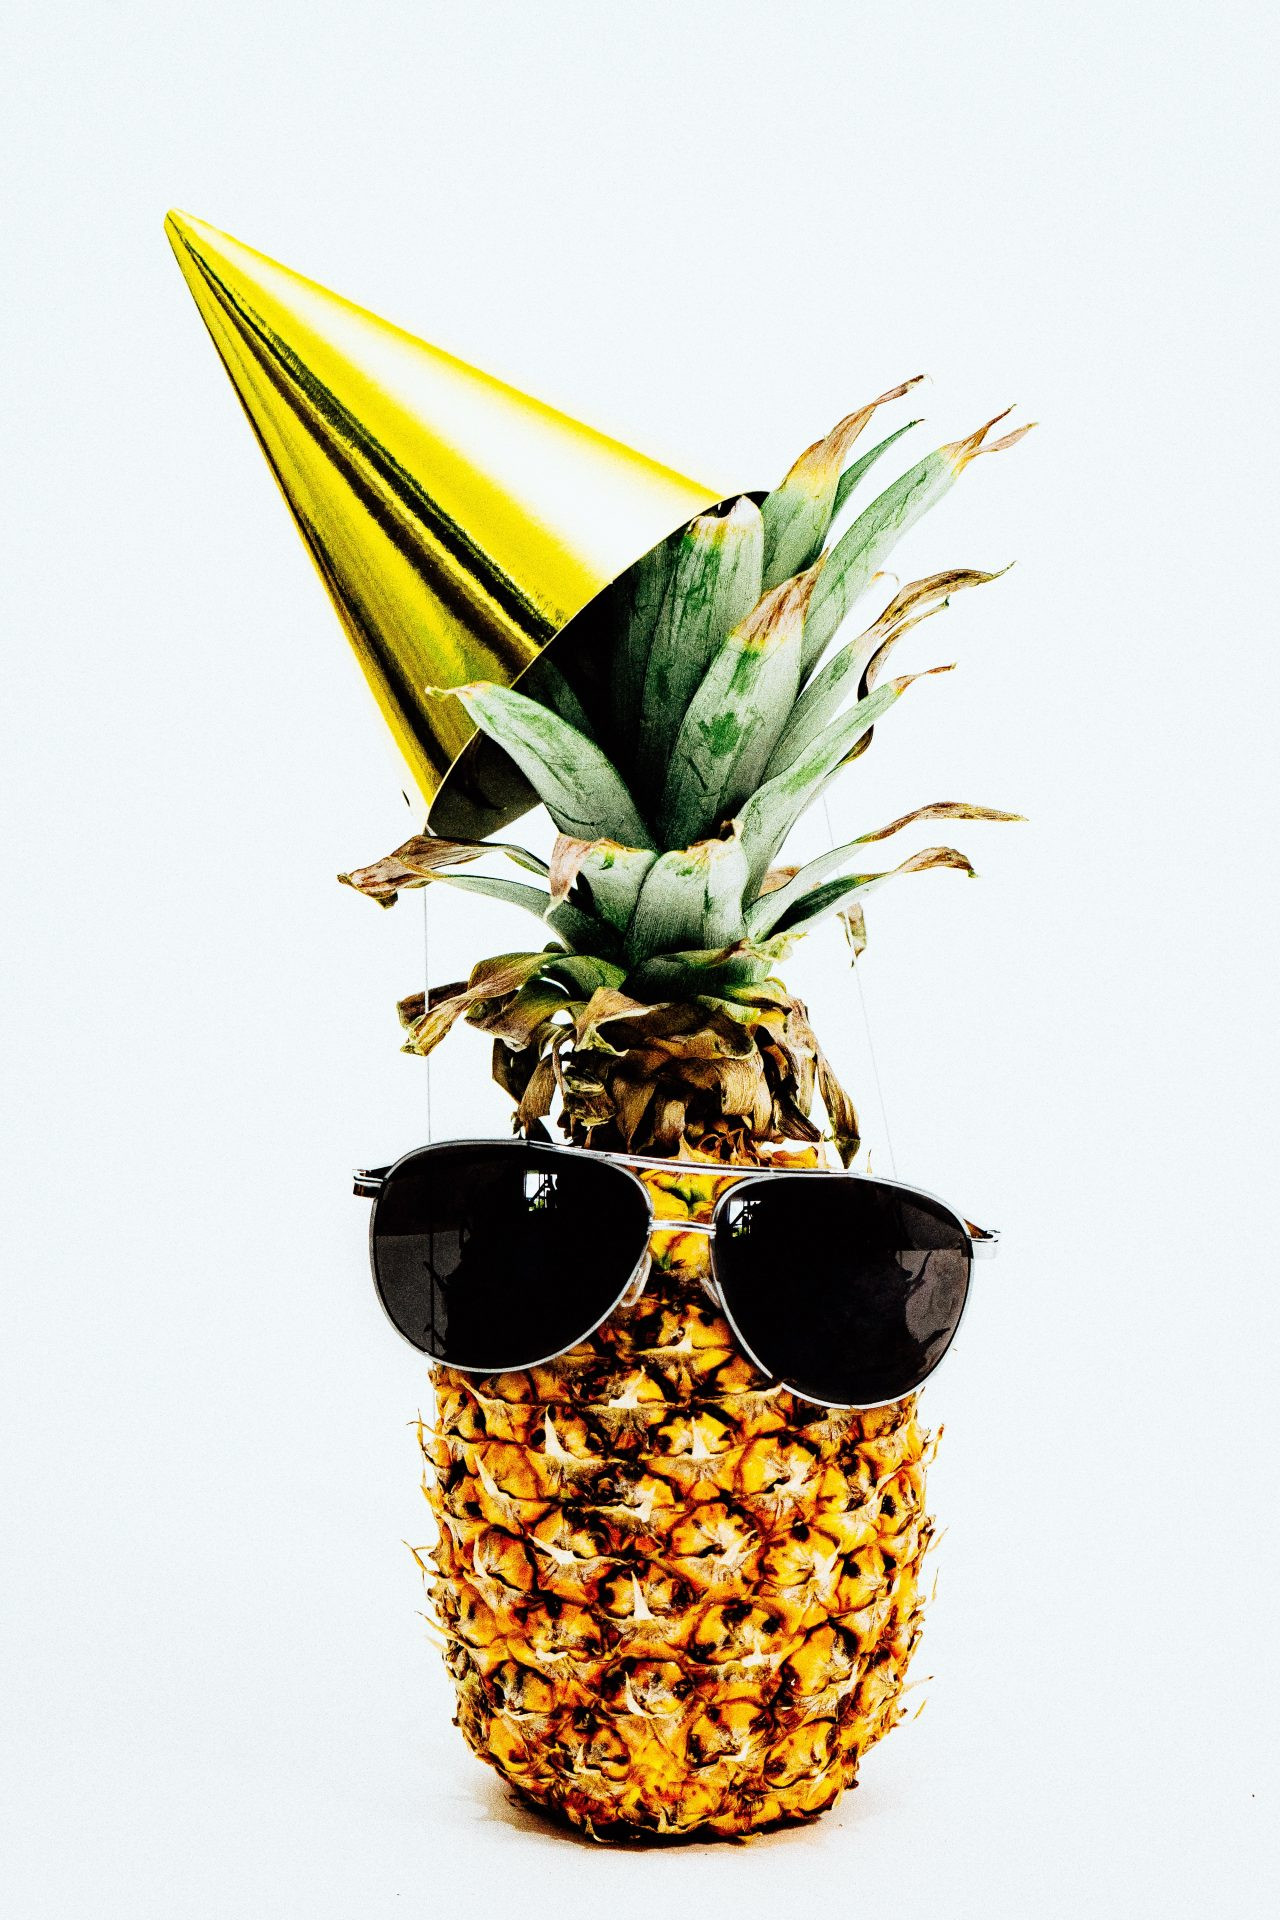 birthday-celebrate-decoration-1071878-1280x1920.jpg